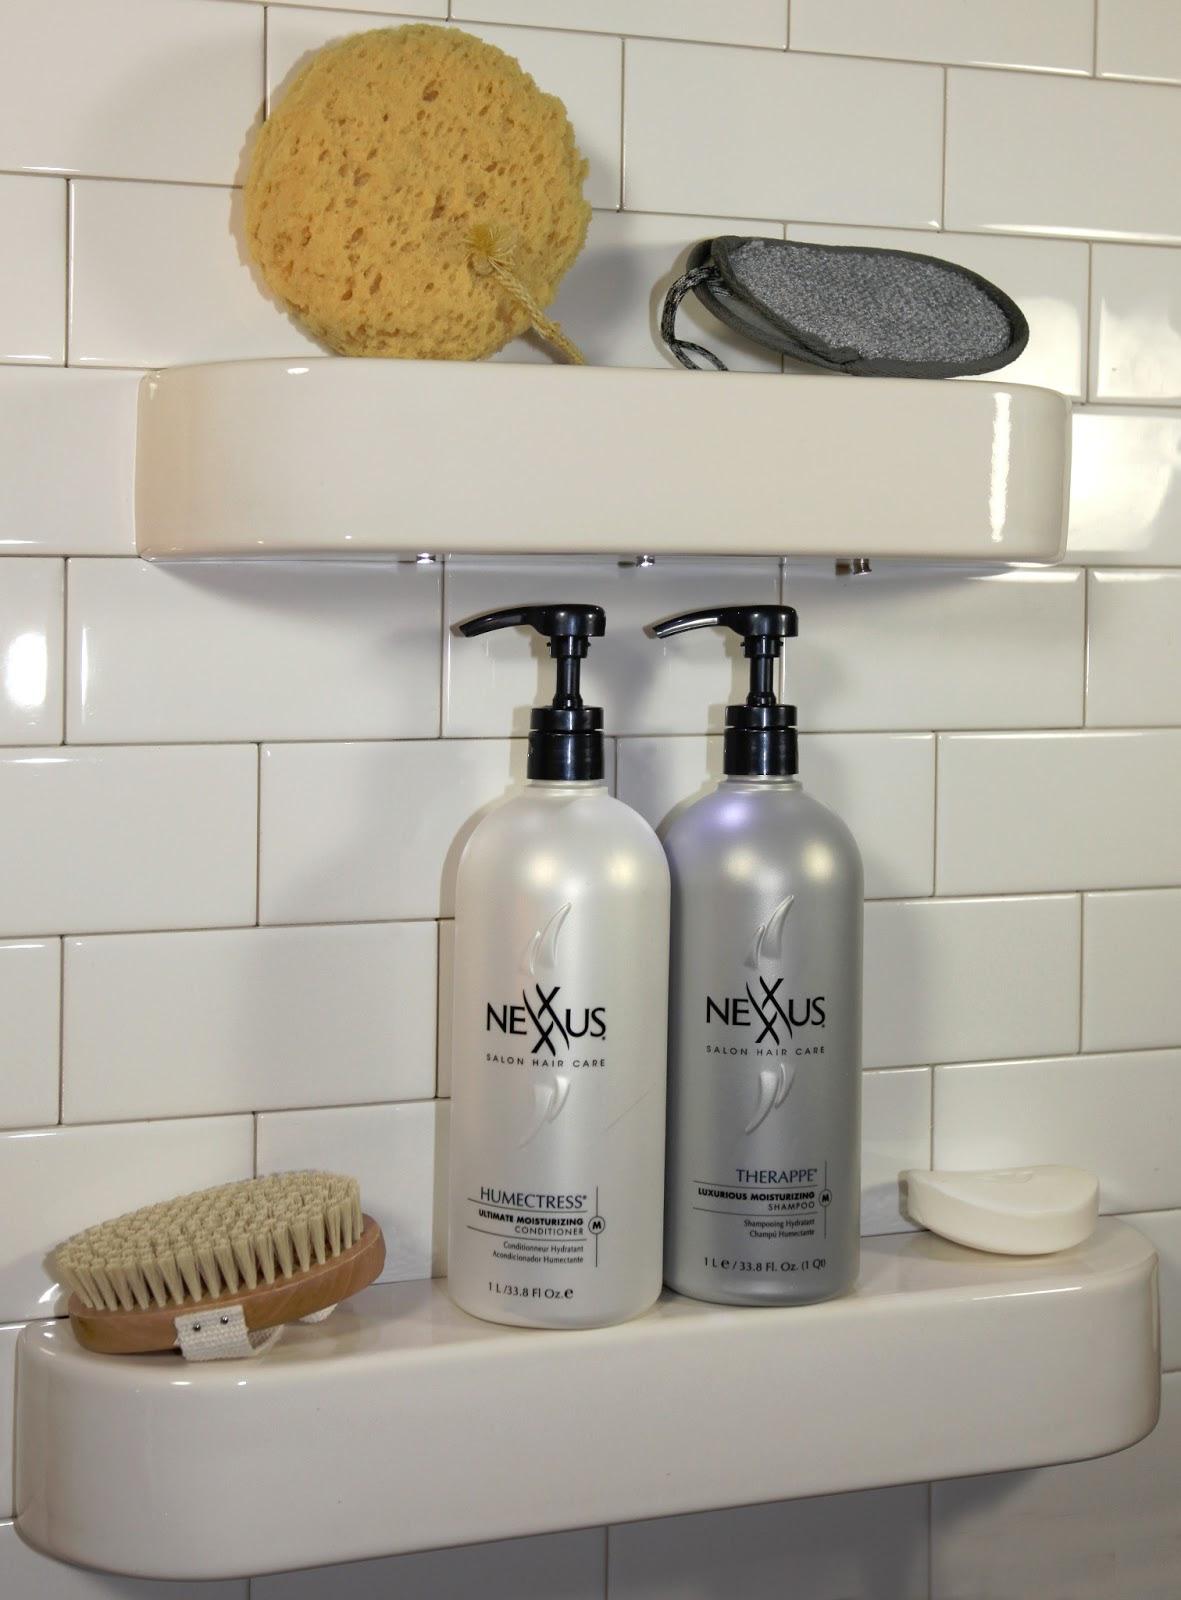 Simple Shampoo Rack for Shower - HomesFeed